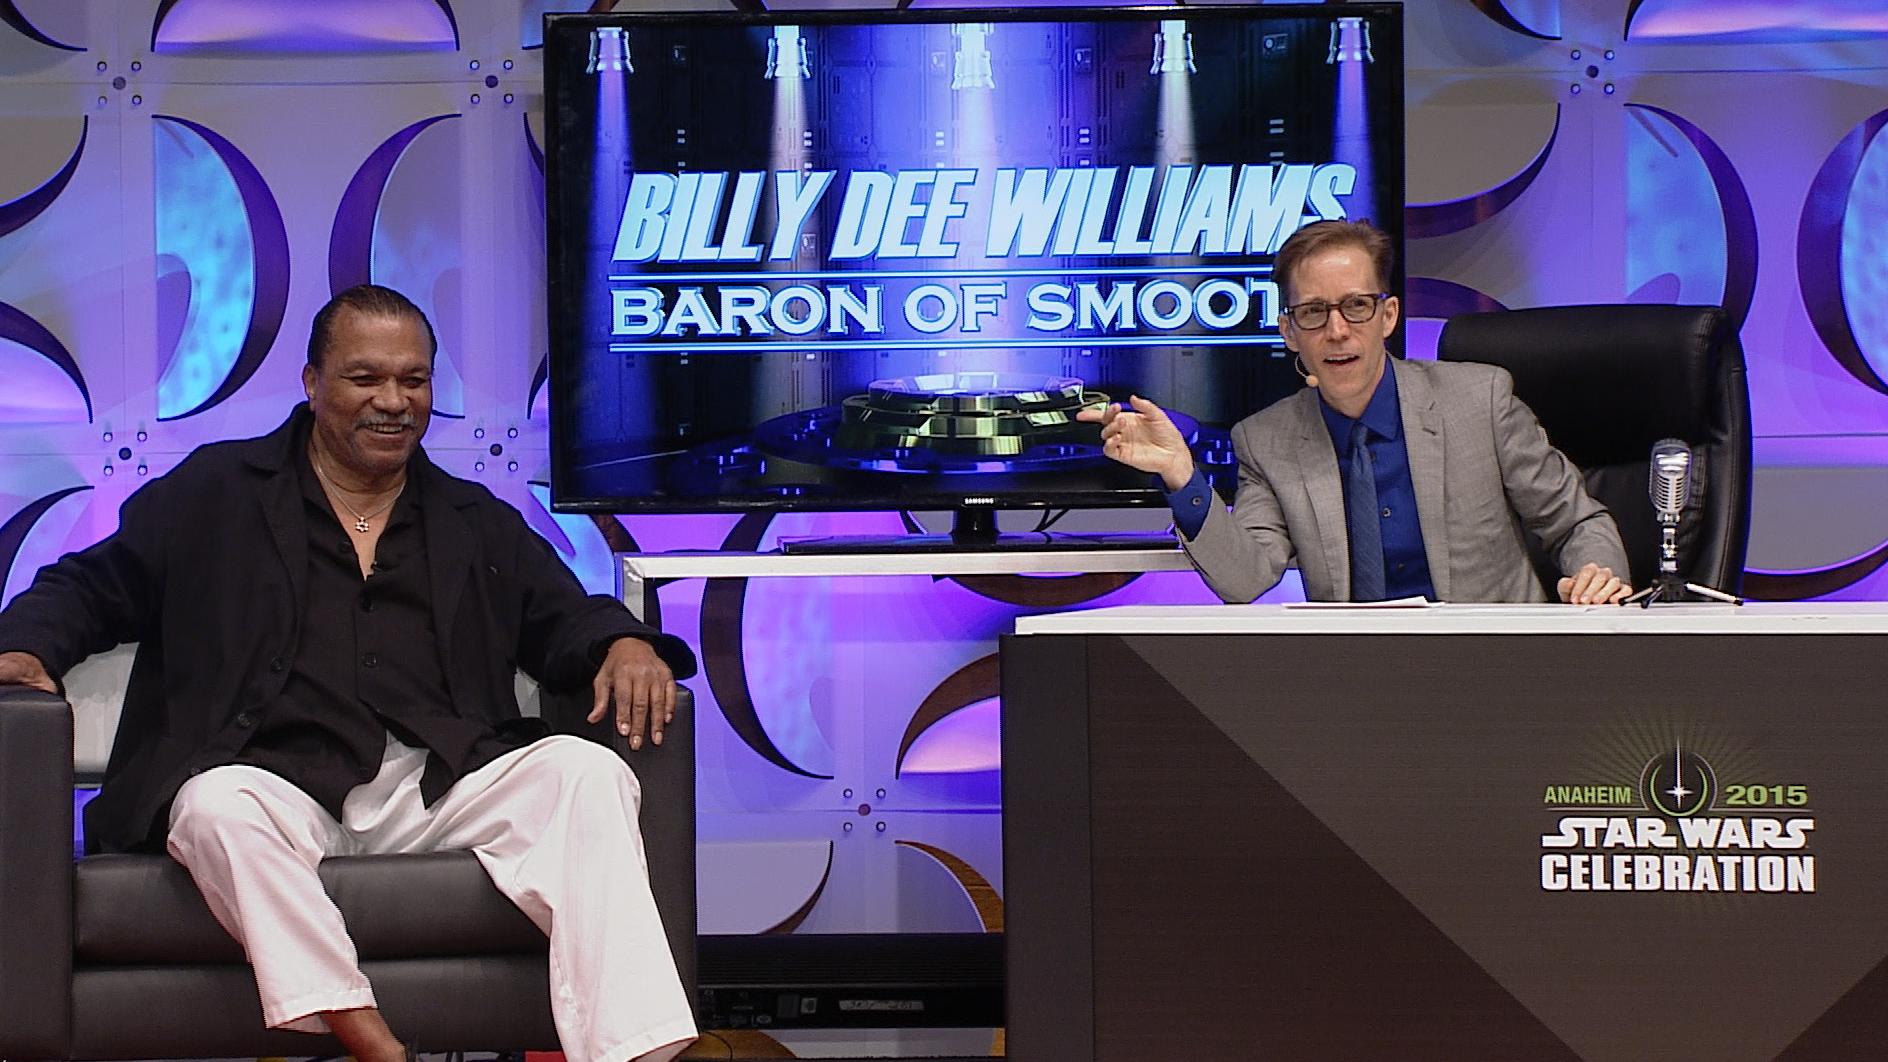 JAT and Billy Dee Williams Star Wars Celebration Anaheim 2015